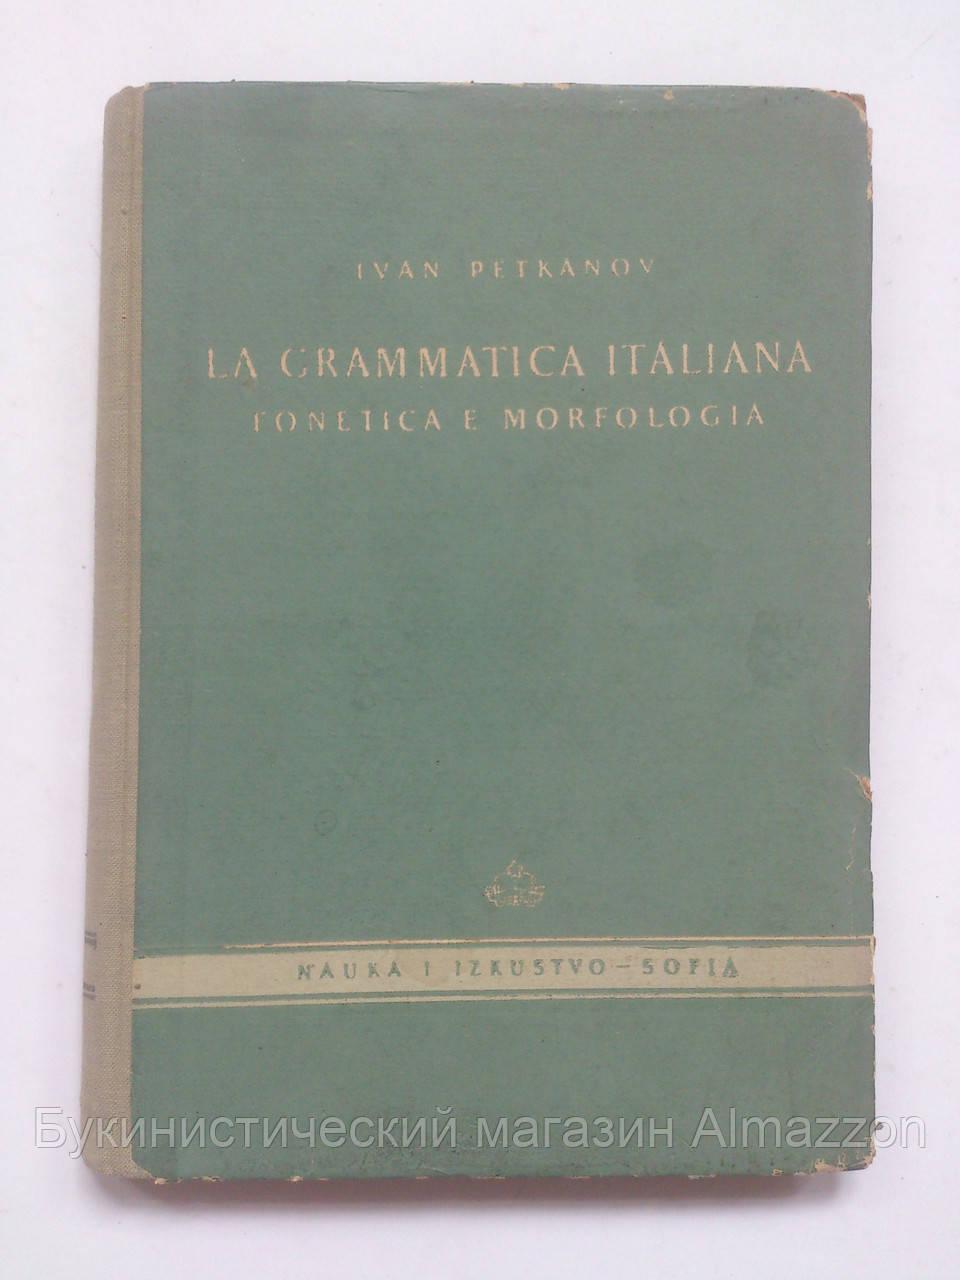 La Grammatica Italiana Fonetica e Morfologia. Ivan Petkanov, фото 1